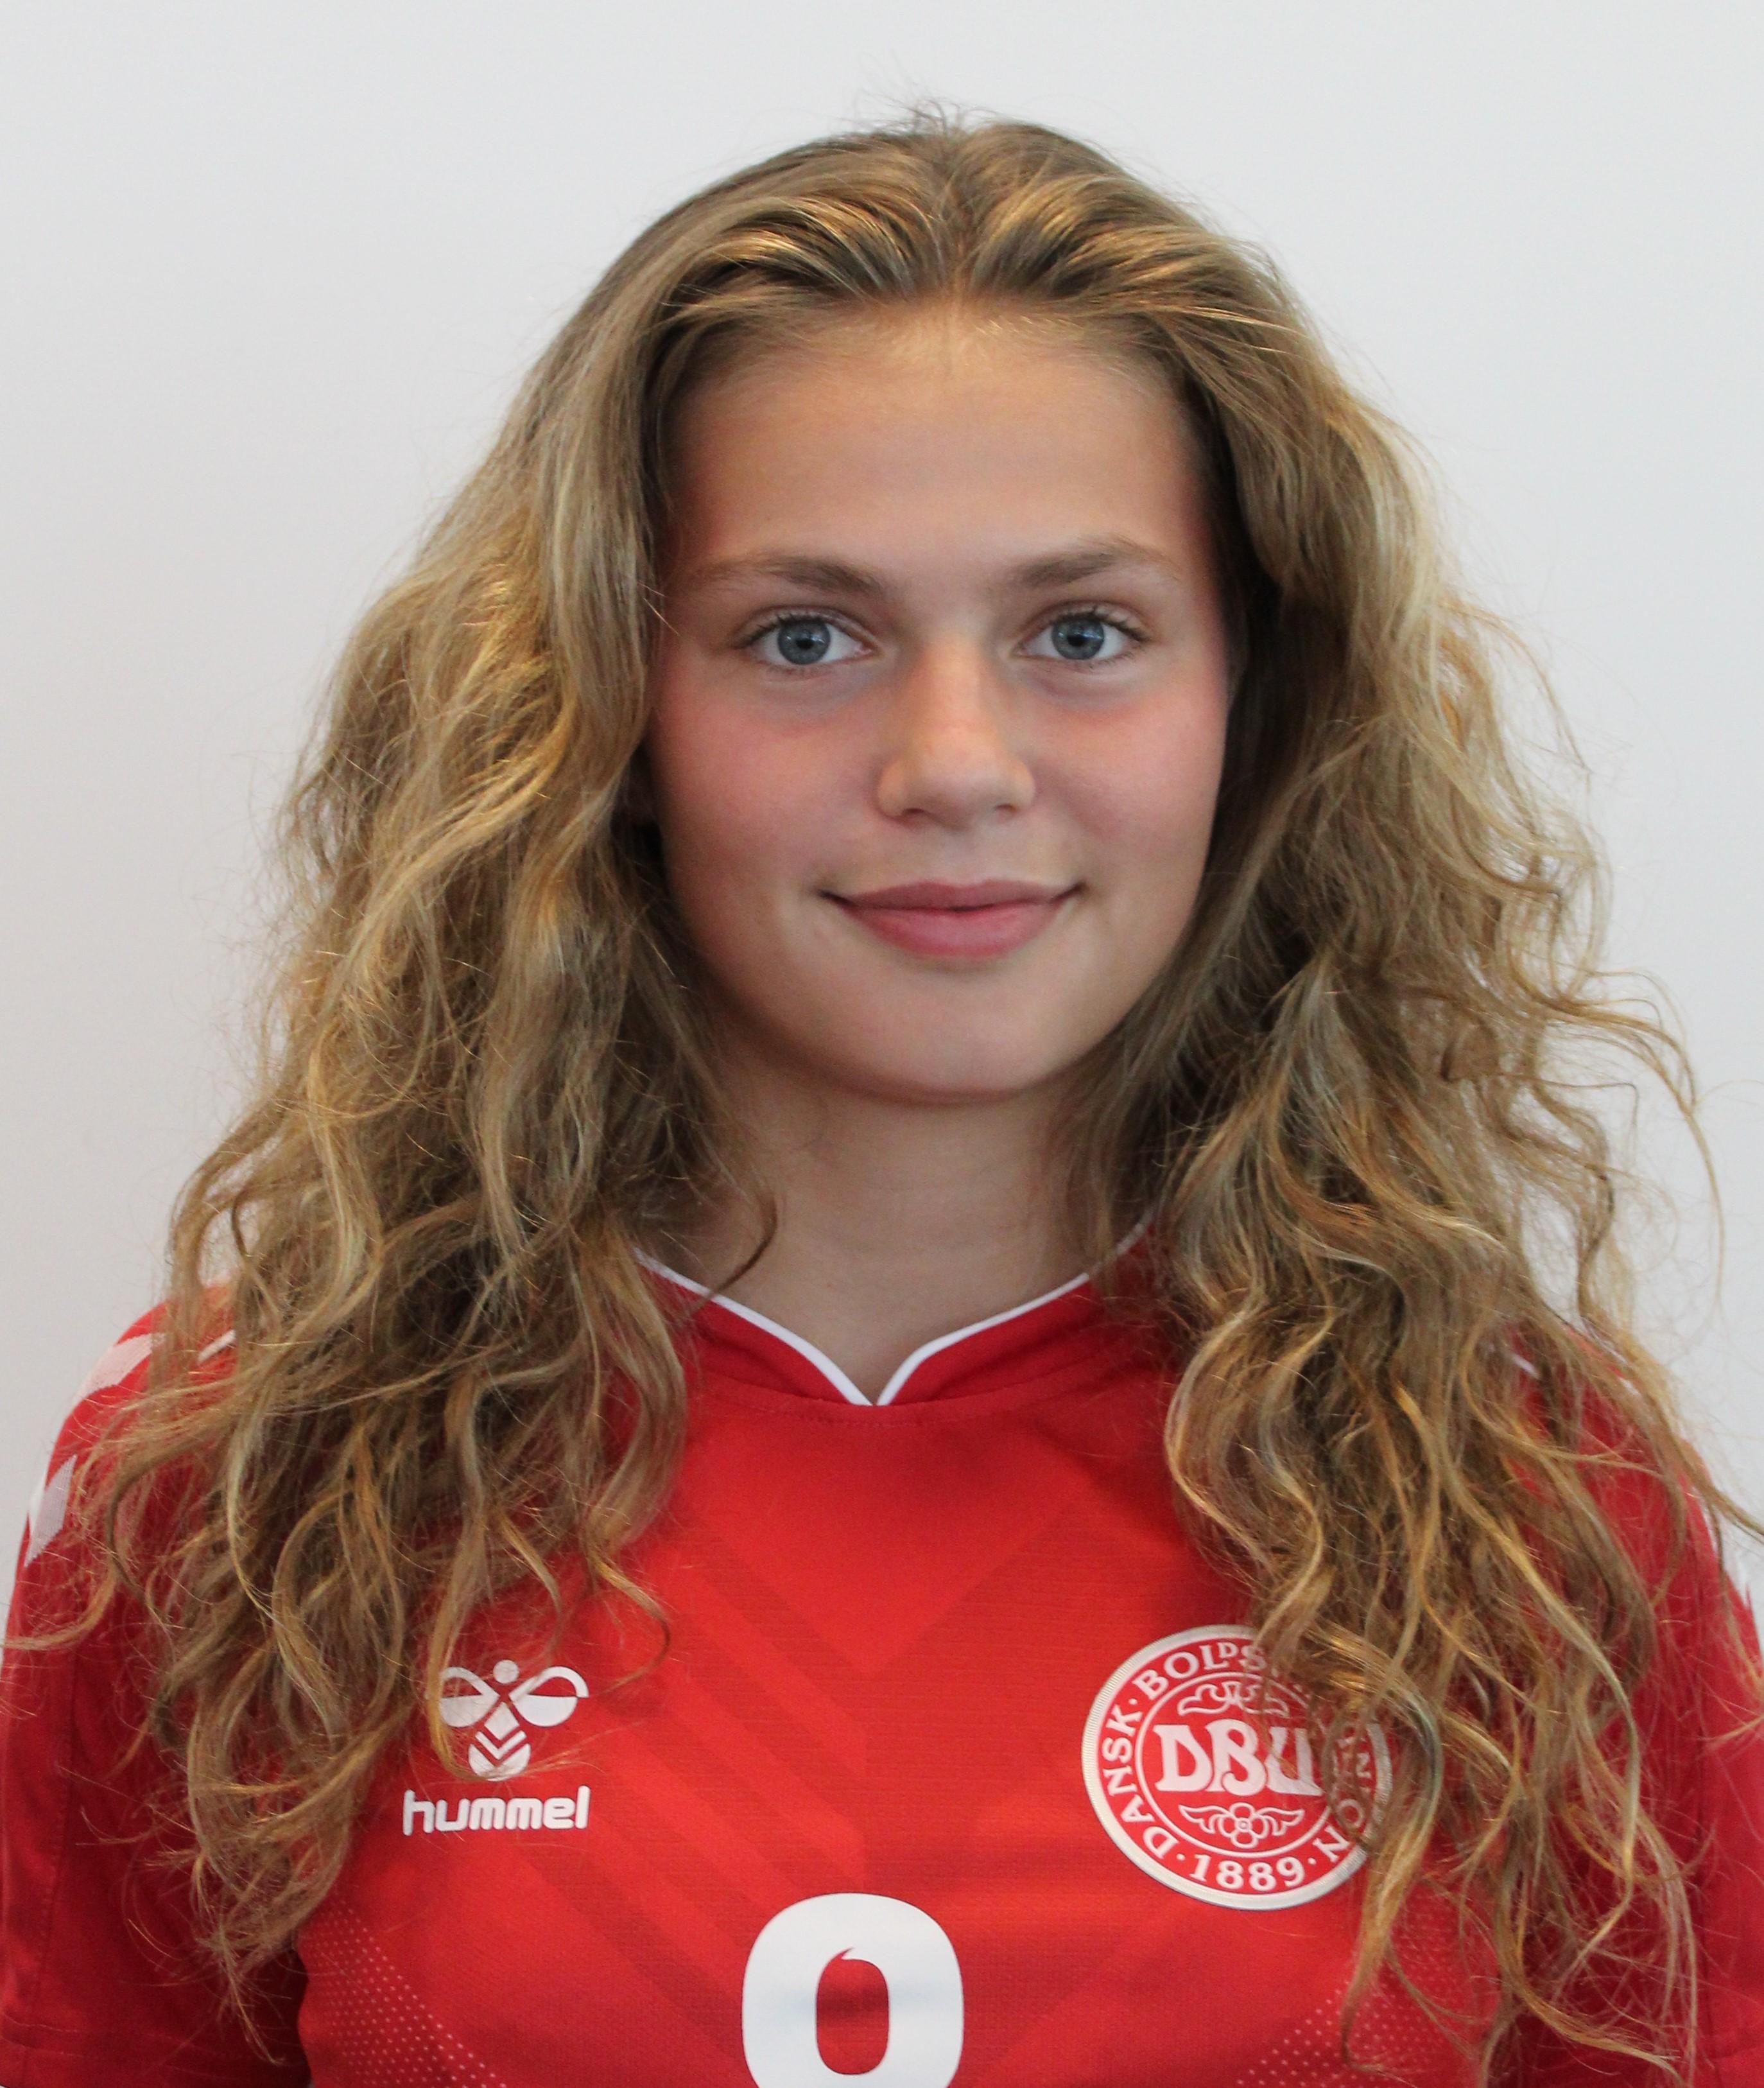 Maja Hagemann